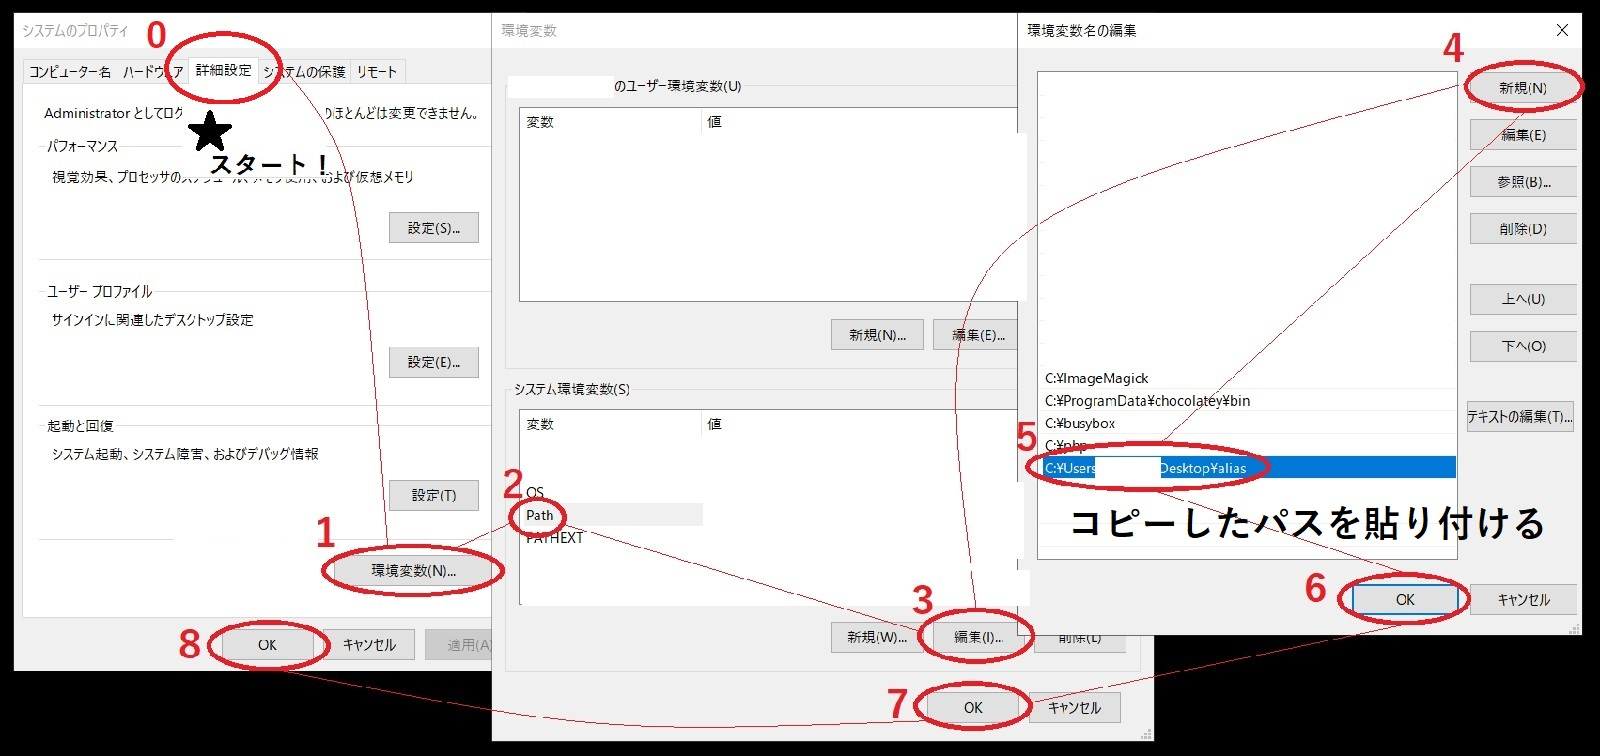 WindowsでPathを通す手順の画像です